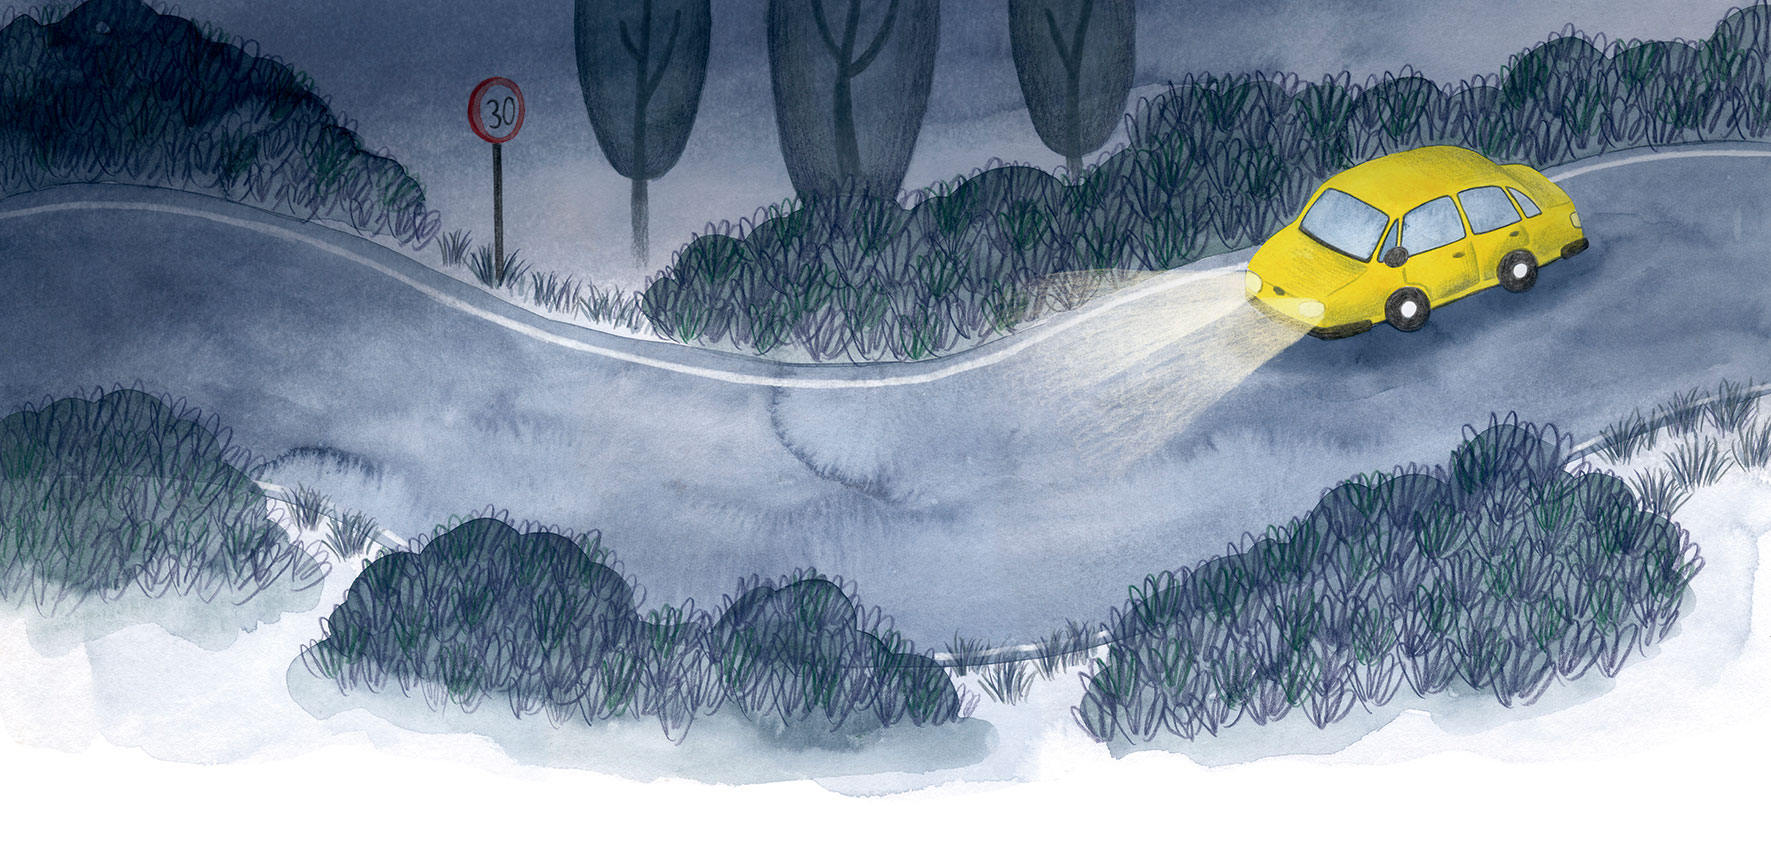 O misterio dos fillos de Lúa, SM, Xerme, El Barco de Vapor, serie naranja, Fina Casalderrey, ilustración de gatos, ilustración infantil, ilustración de escena de noche, ilustración de carretera de noche,